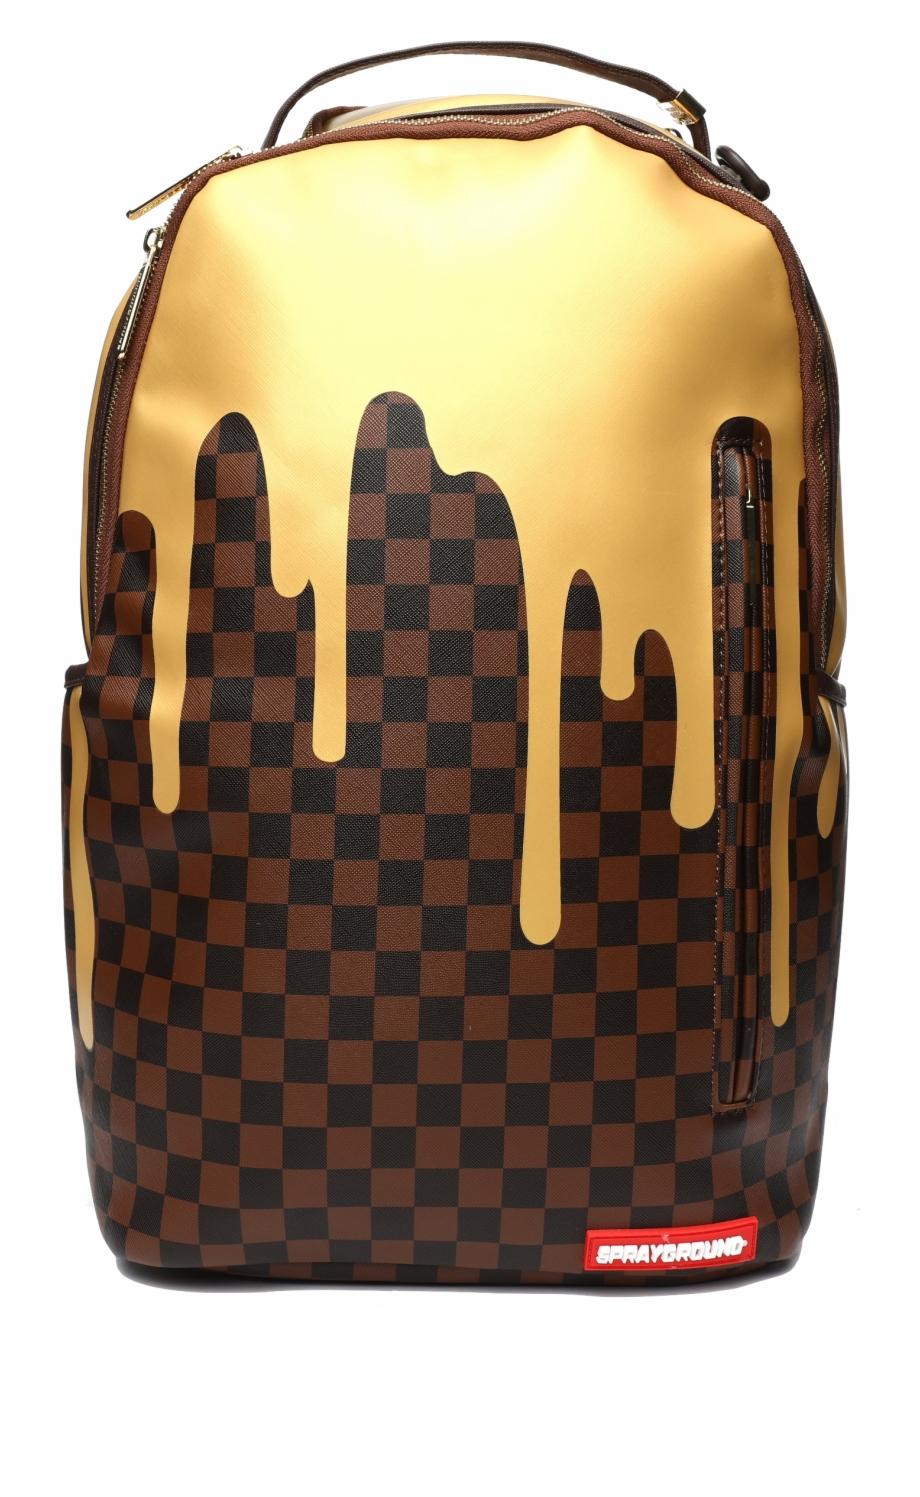 Sprayground Gold Checkered Drips Backpack.